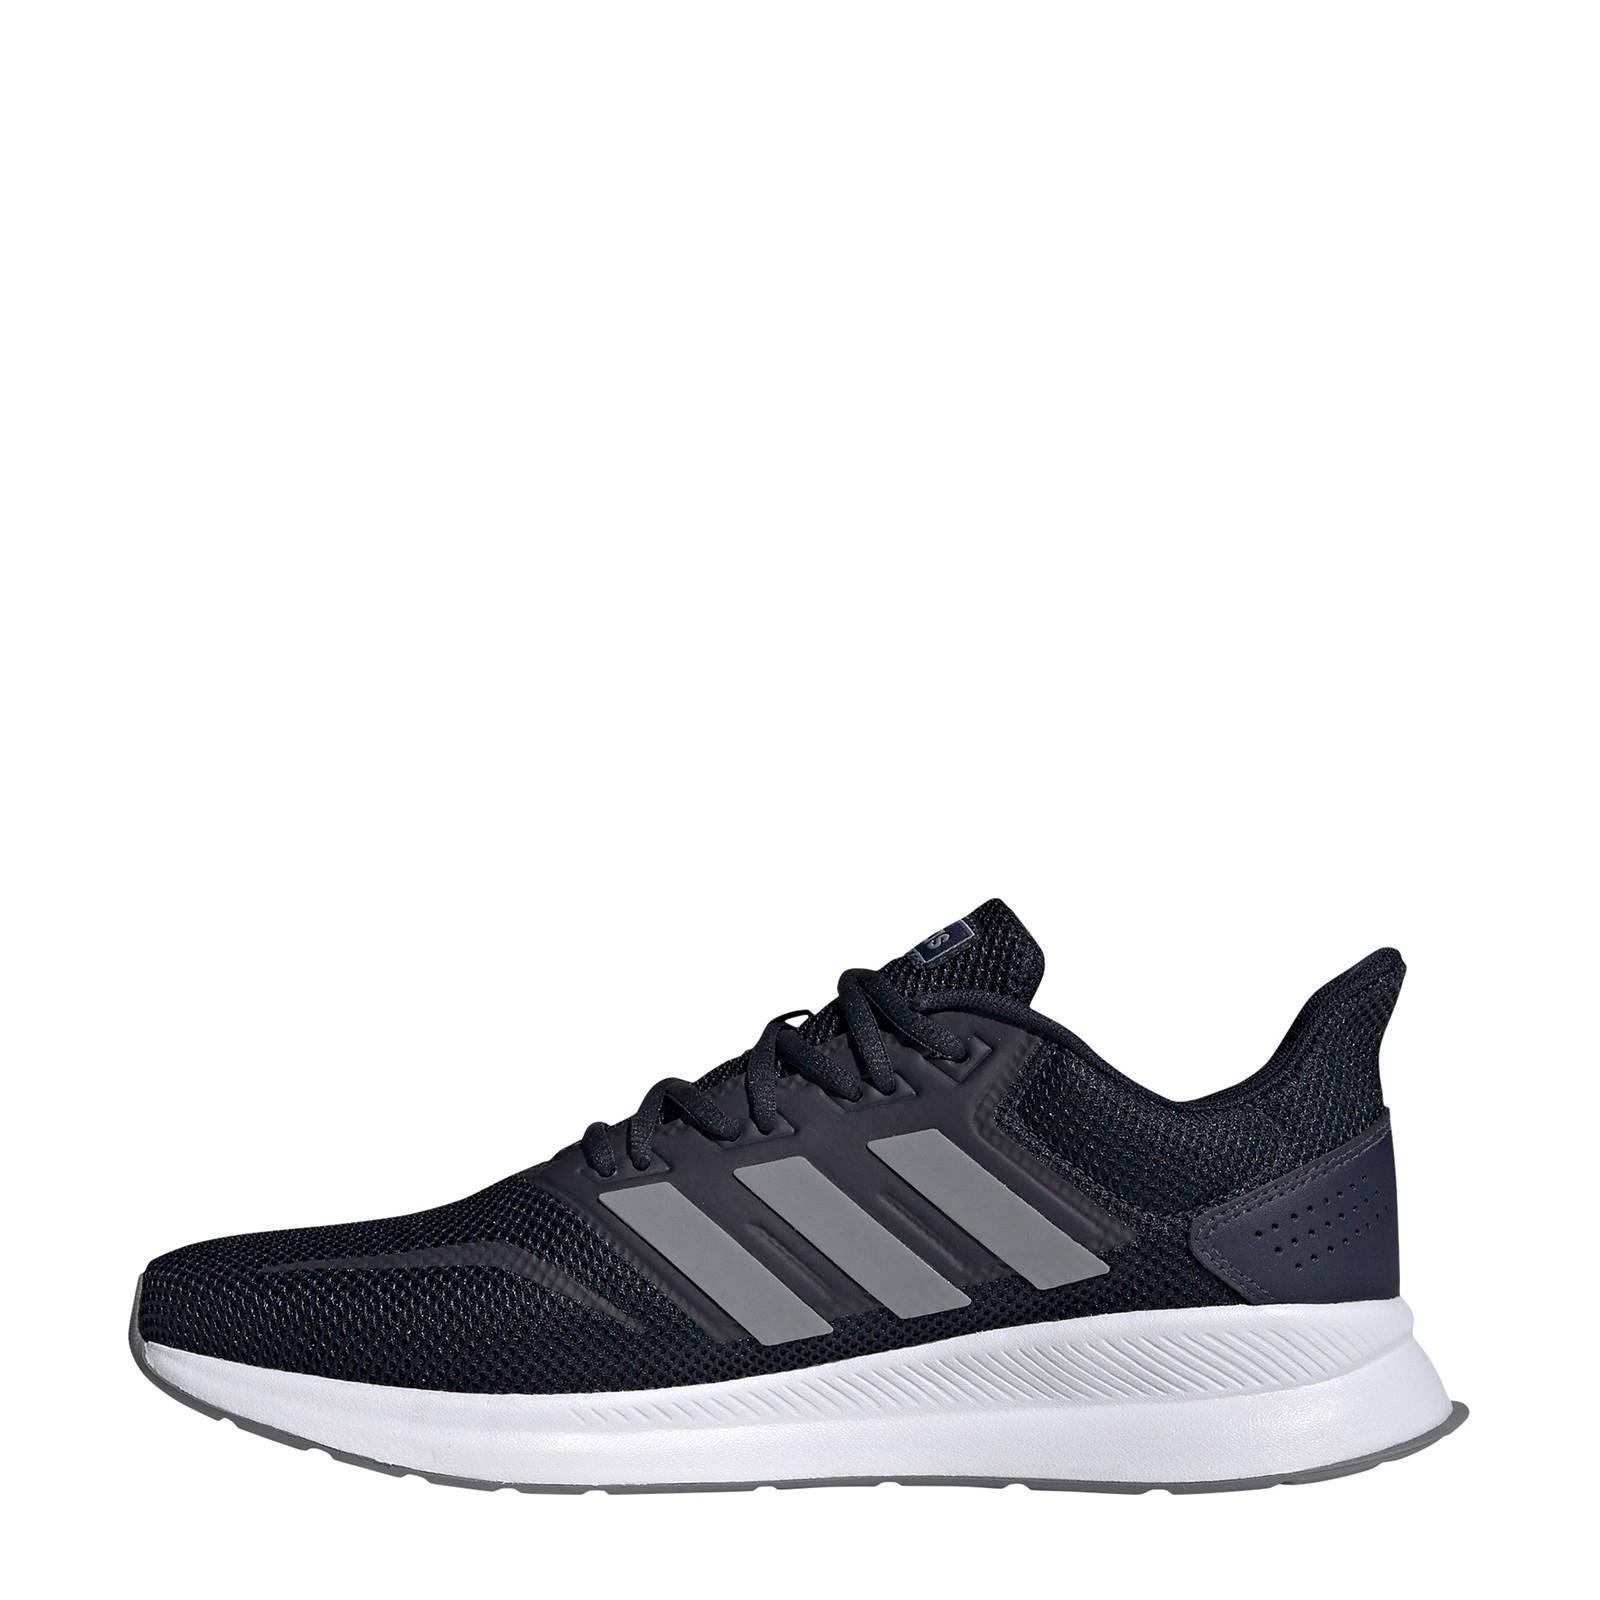 adidas Performance Runfalcon hardloopschoenen blauwgrijs